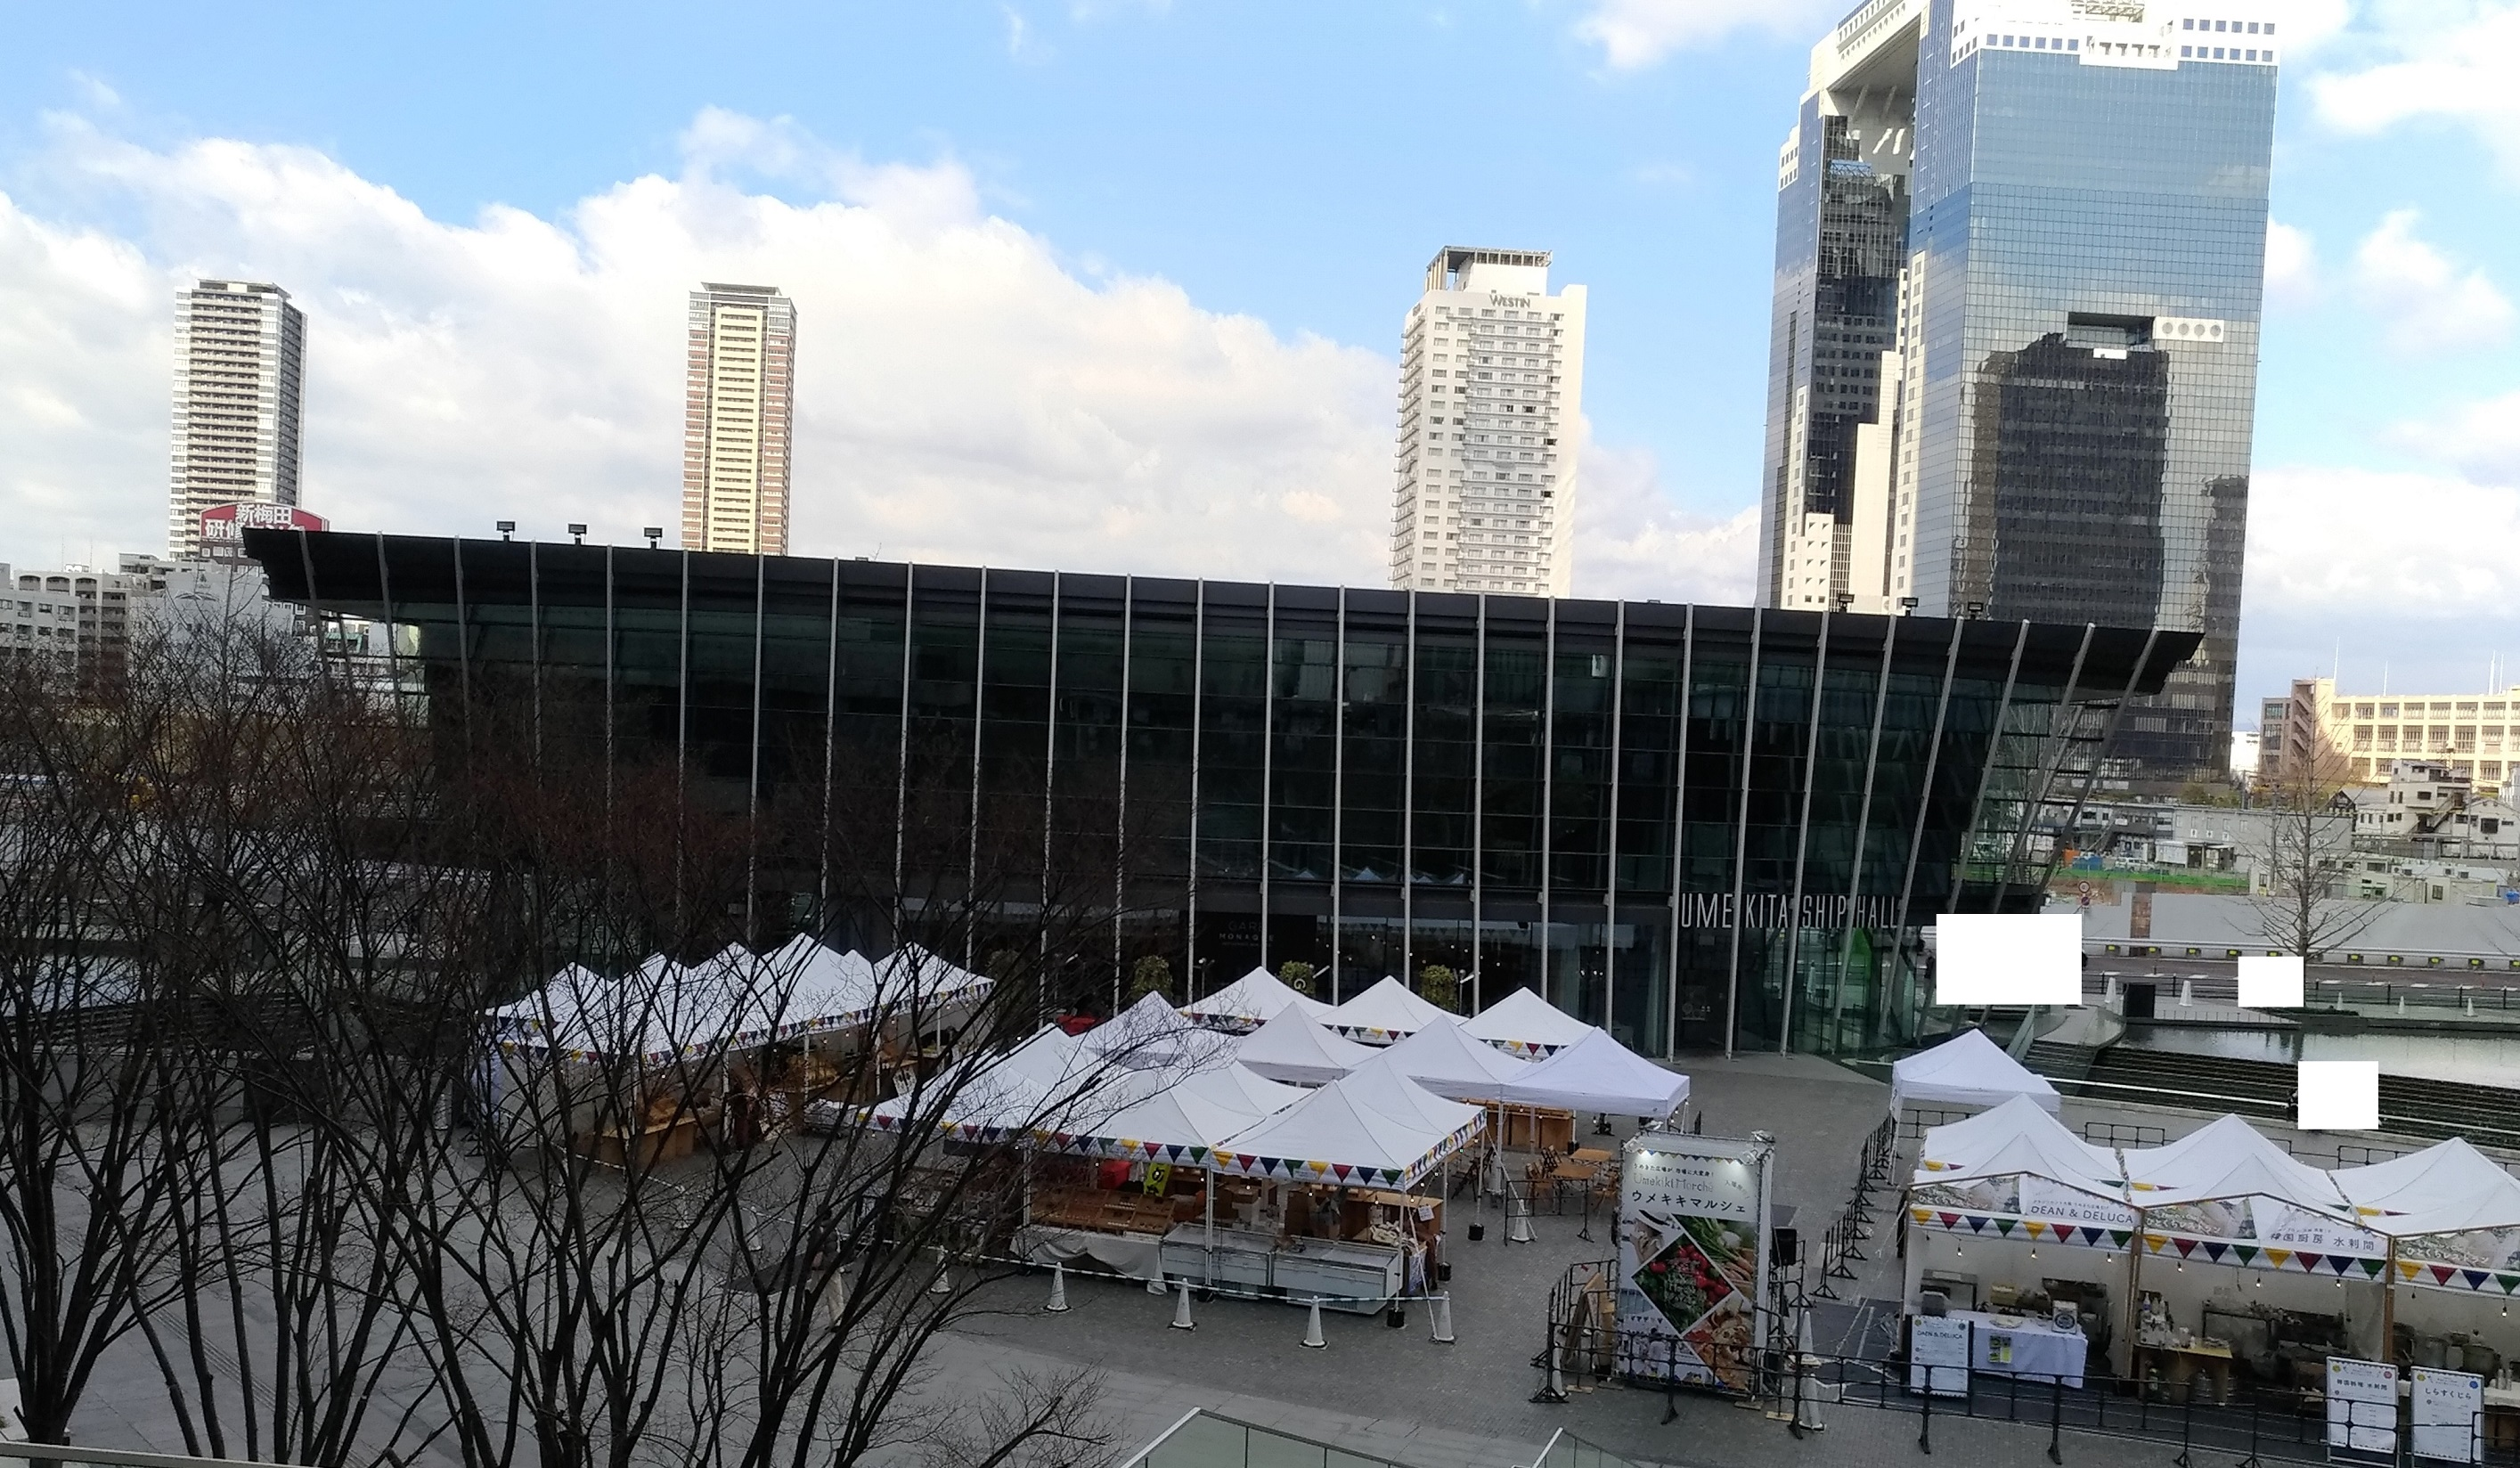 osaka_umeda_events_umekiki_2.jpg